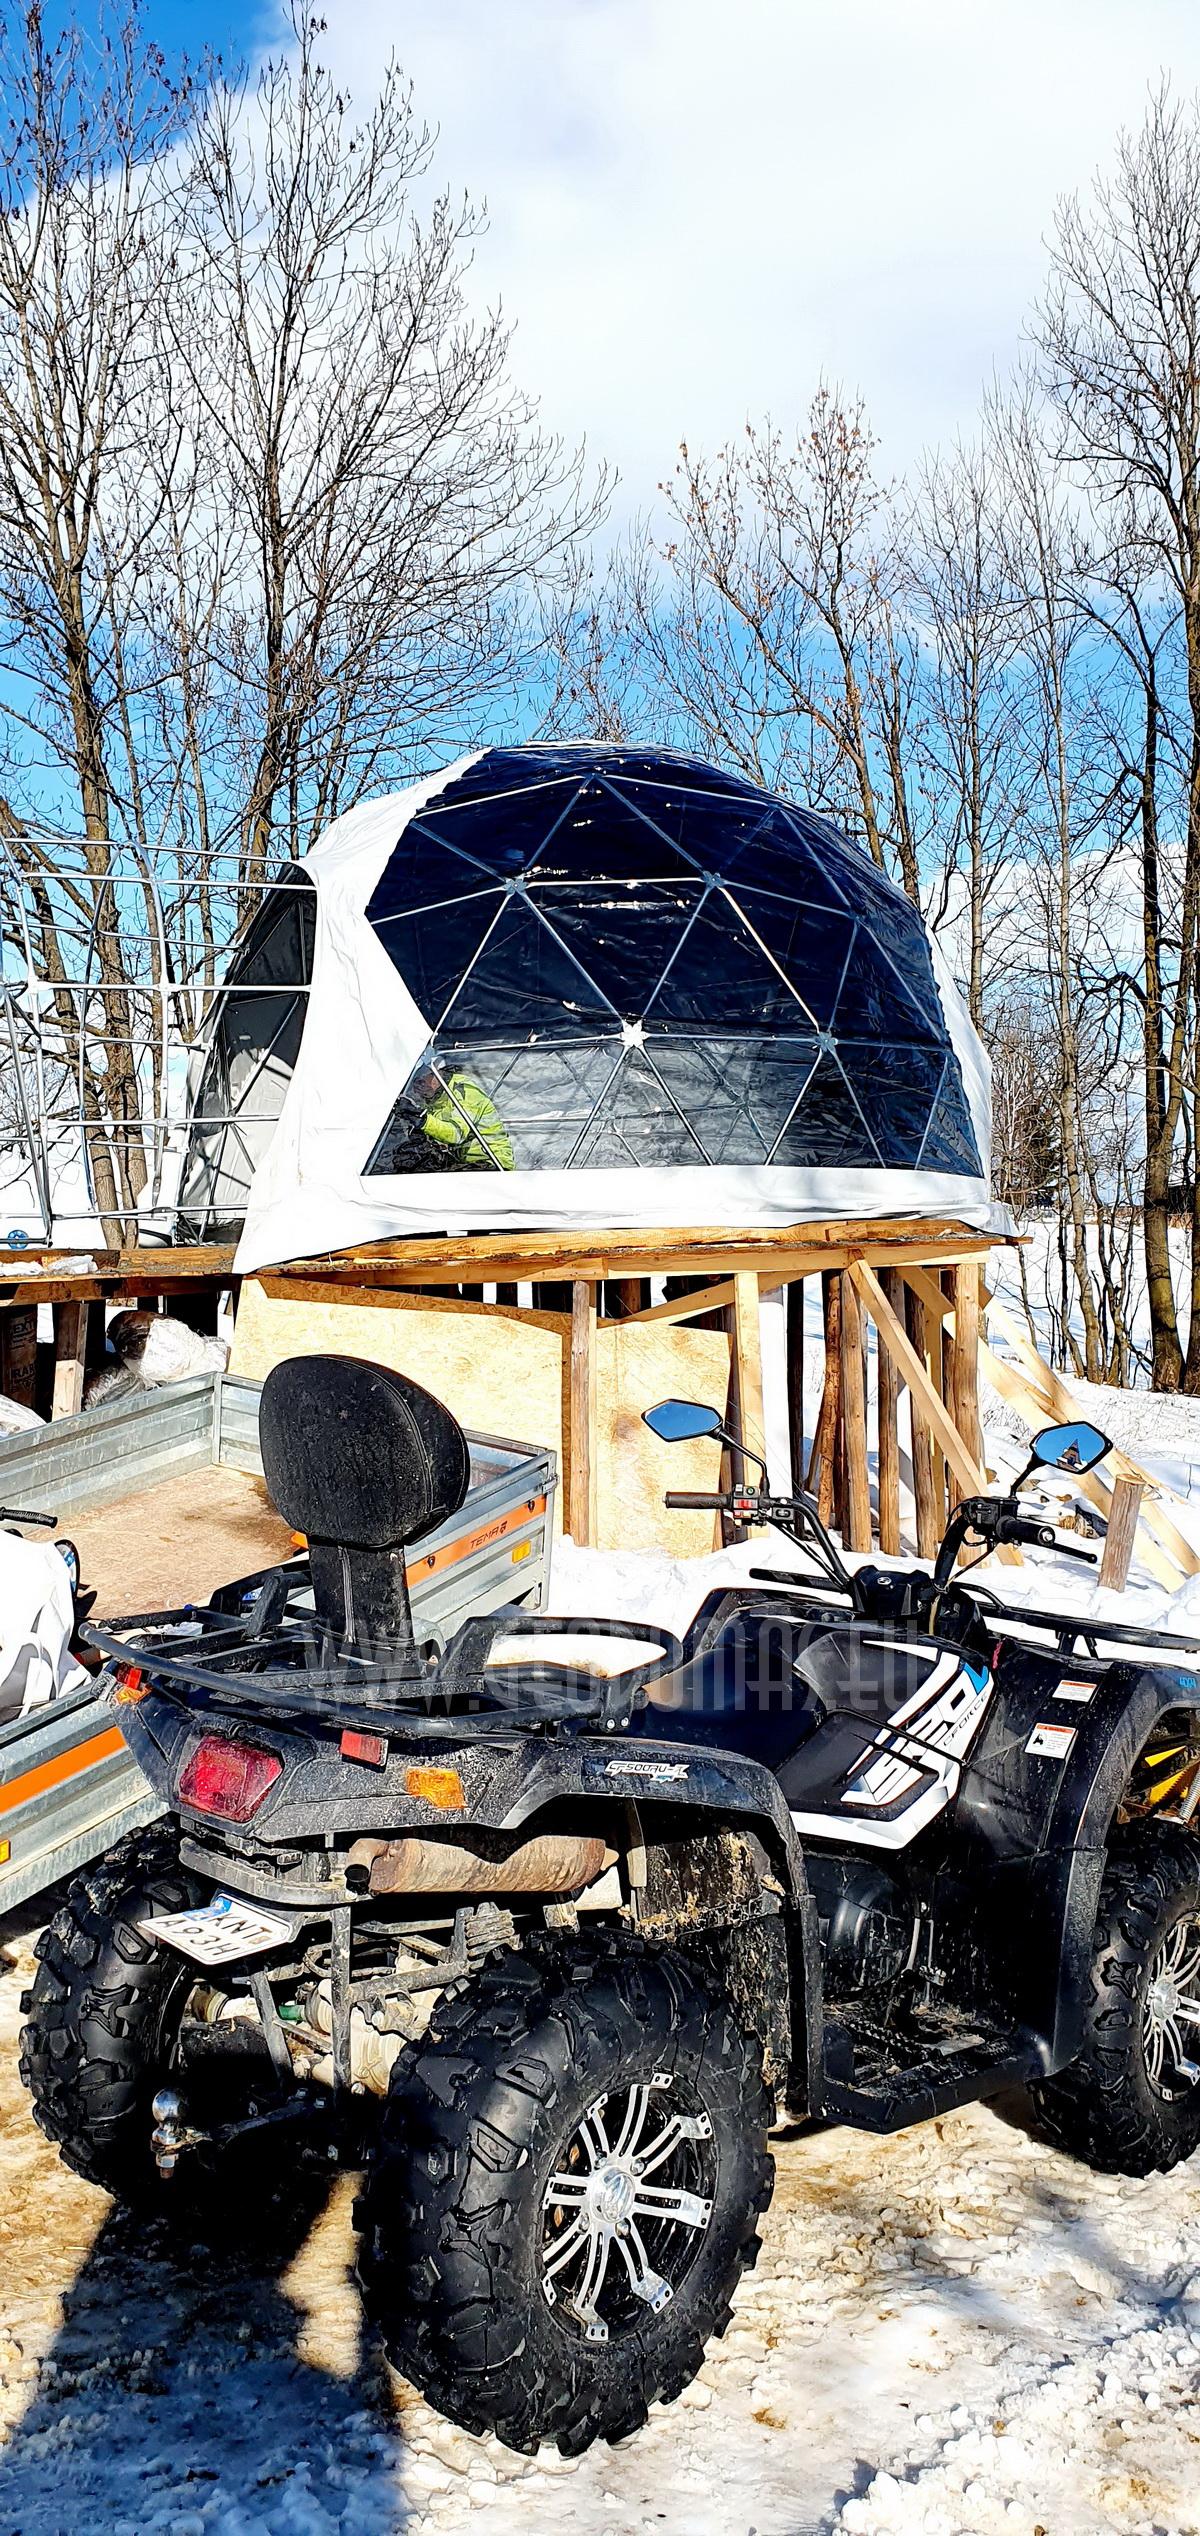 35m²+ 20m² Glamping SPA Domes Ø6,7m & Ø5m | Zakopane Resort, Poland